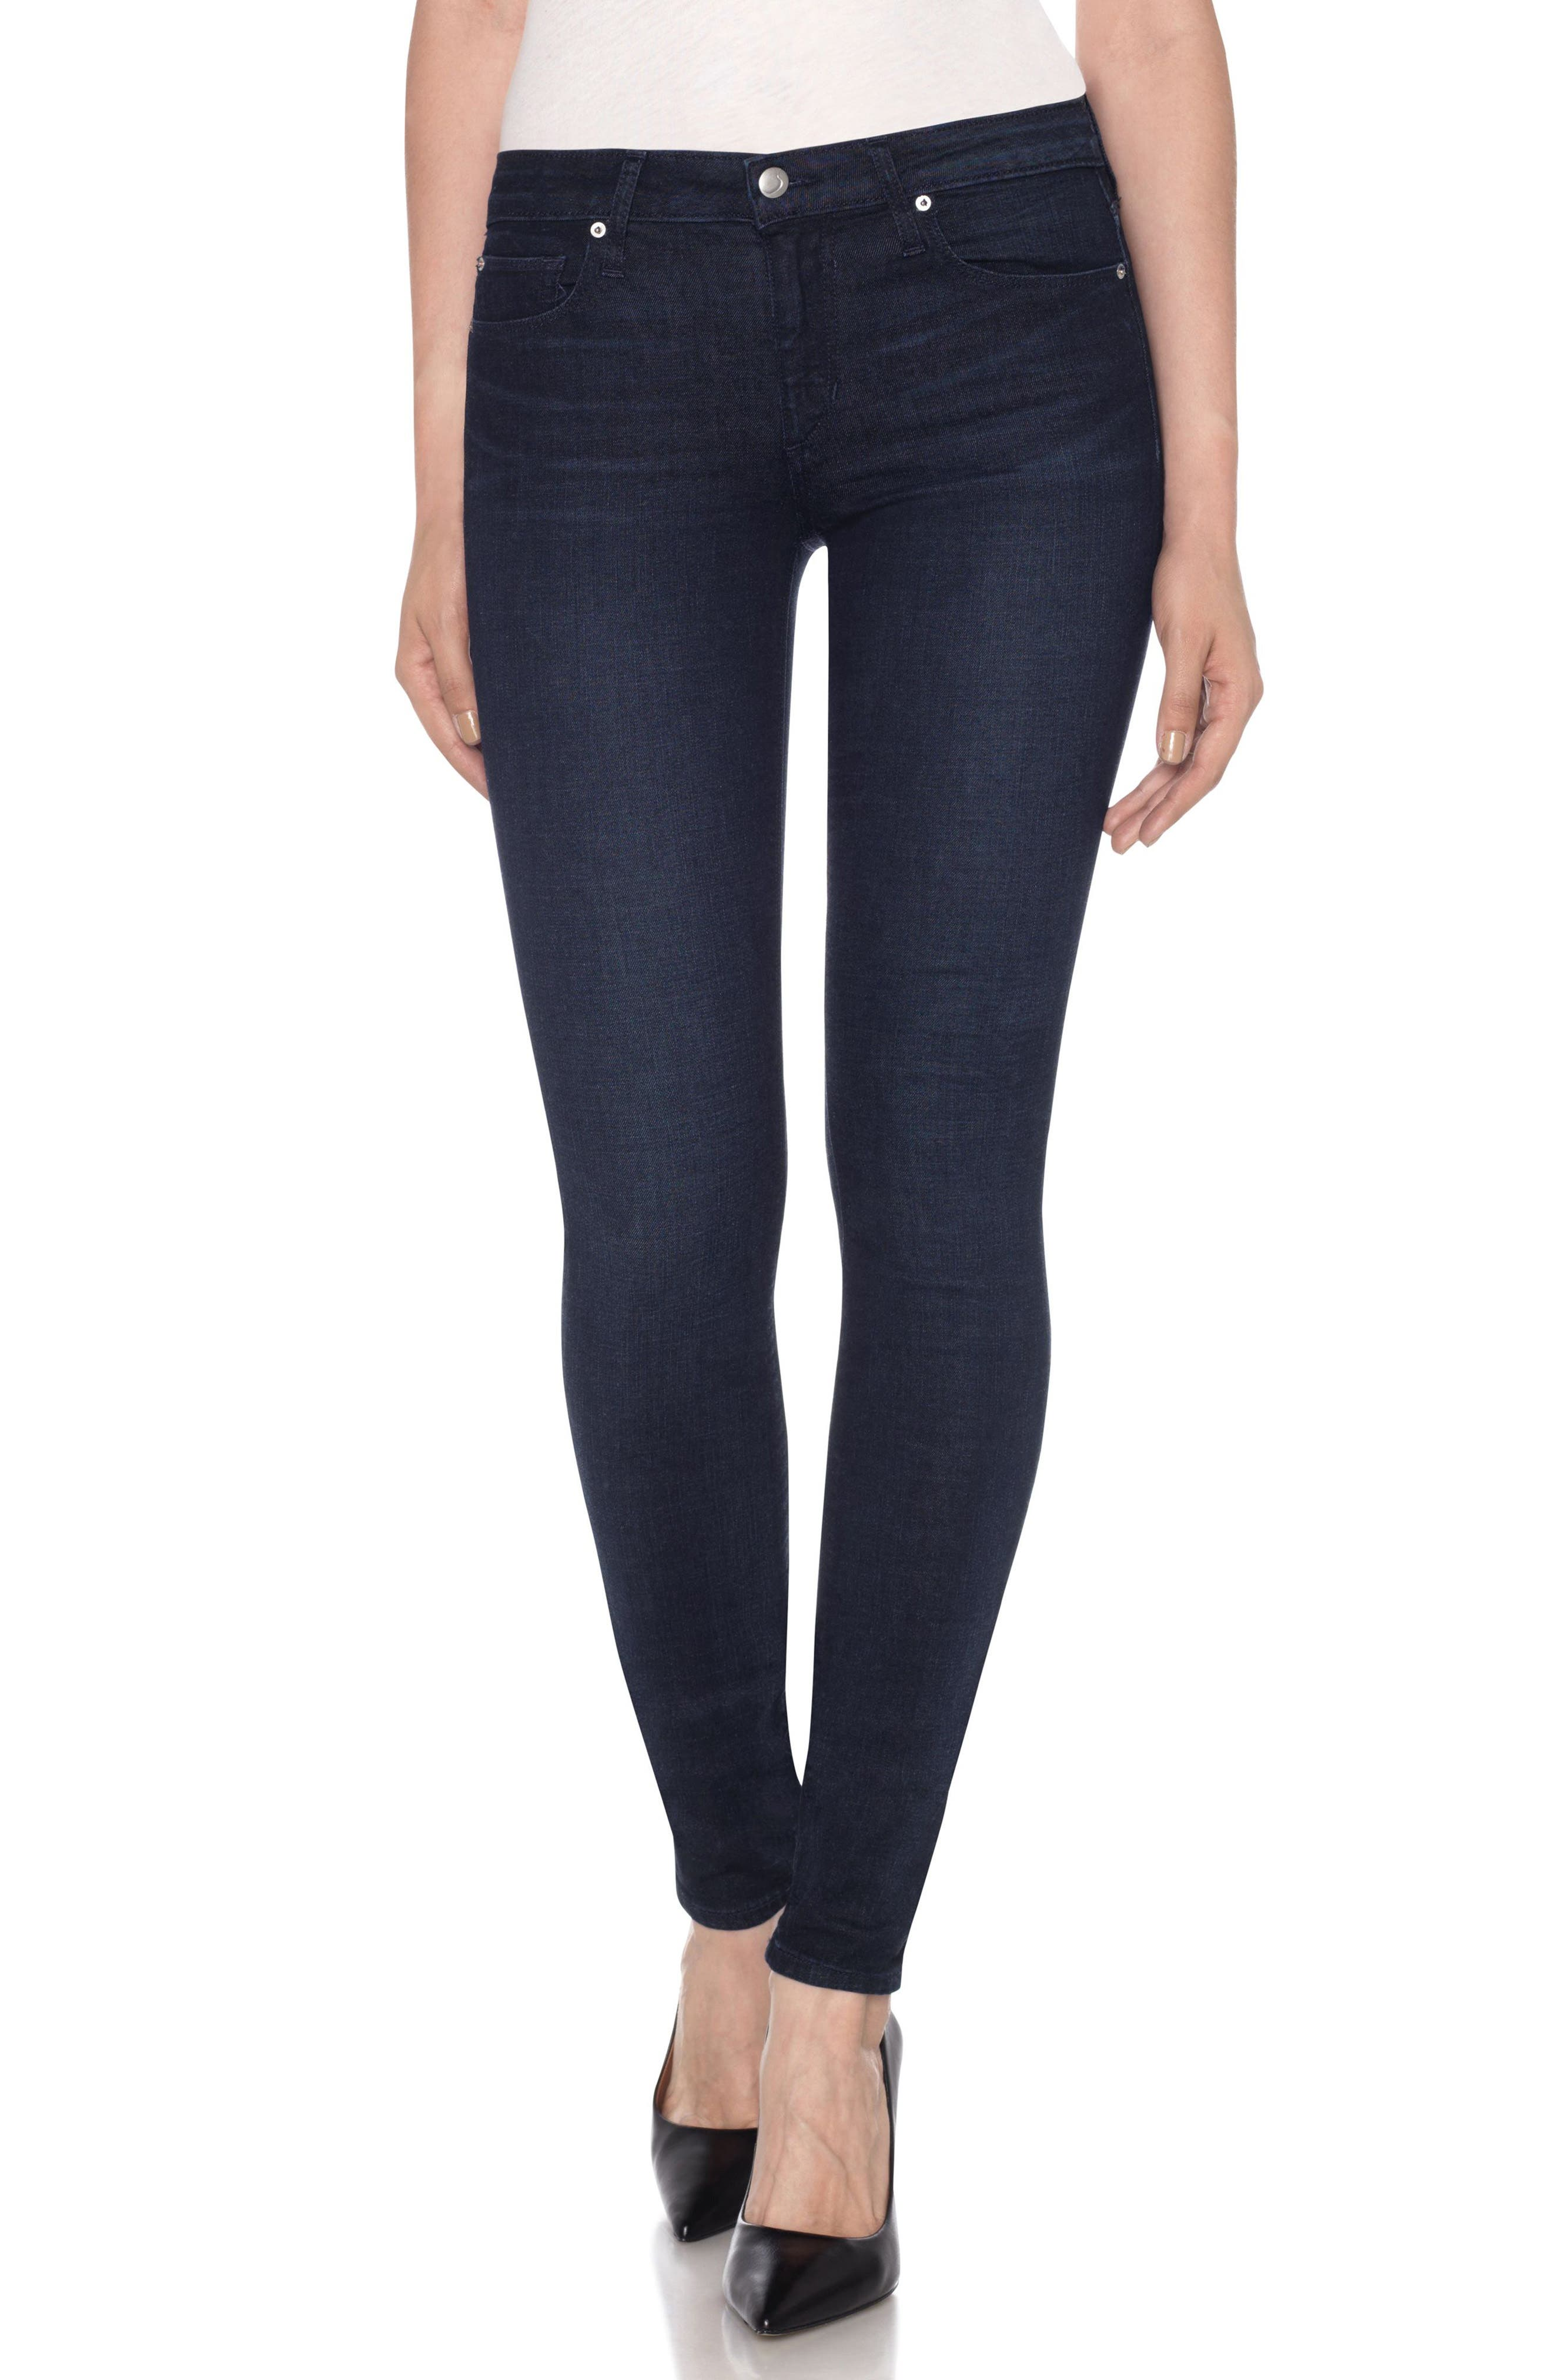 Main Image - Joe's Flawless - Twiggy Skinny Jeans (Foley)